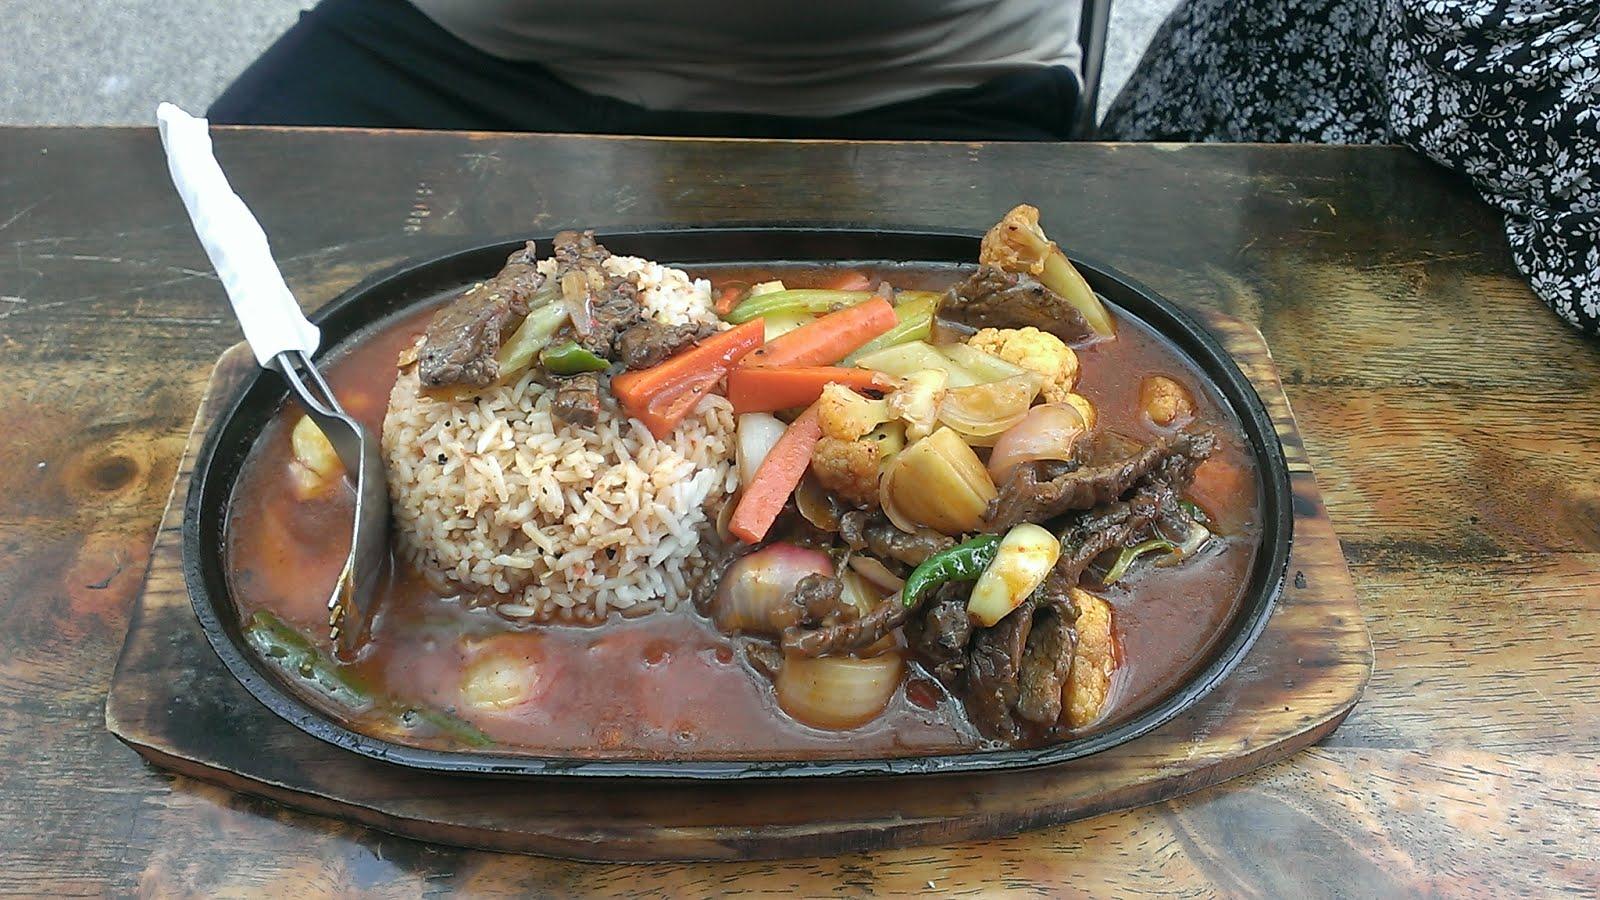 Mr Steak House - Shah Alam, Selangor